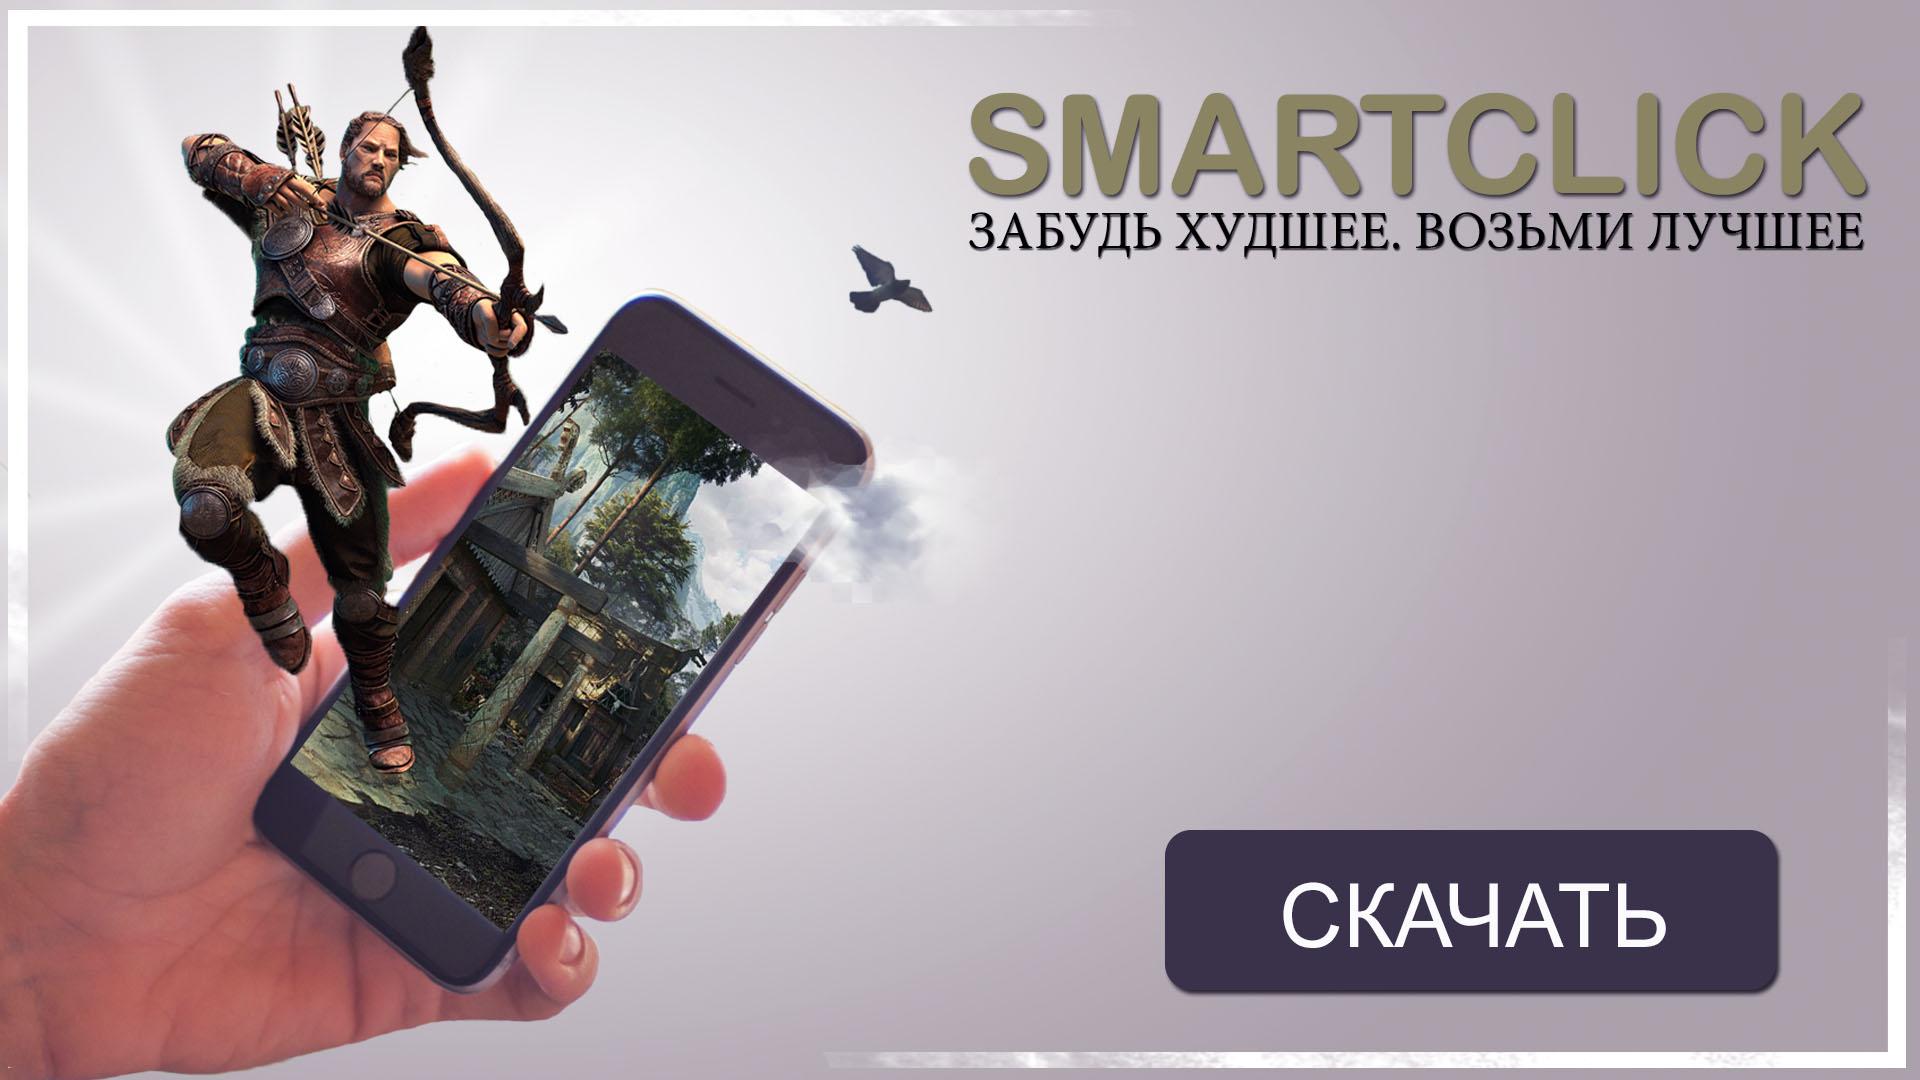 Разработка рекламного баннера мобильного приложения фото f_7835c0f493f4b9ab.jpg